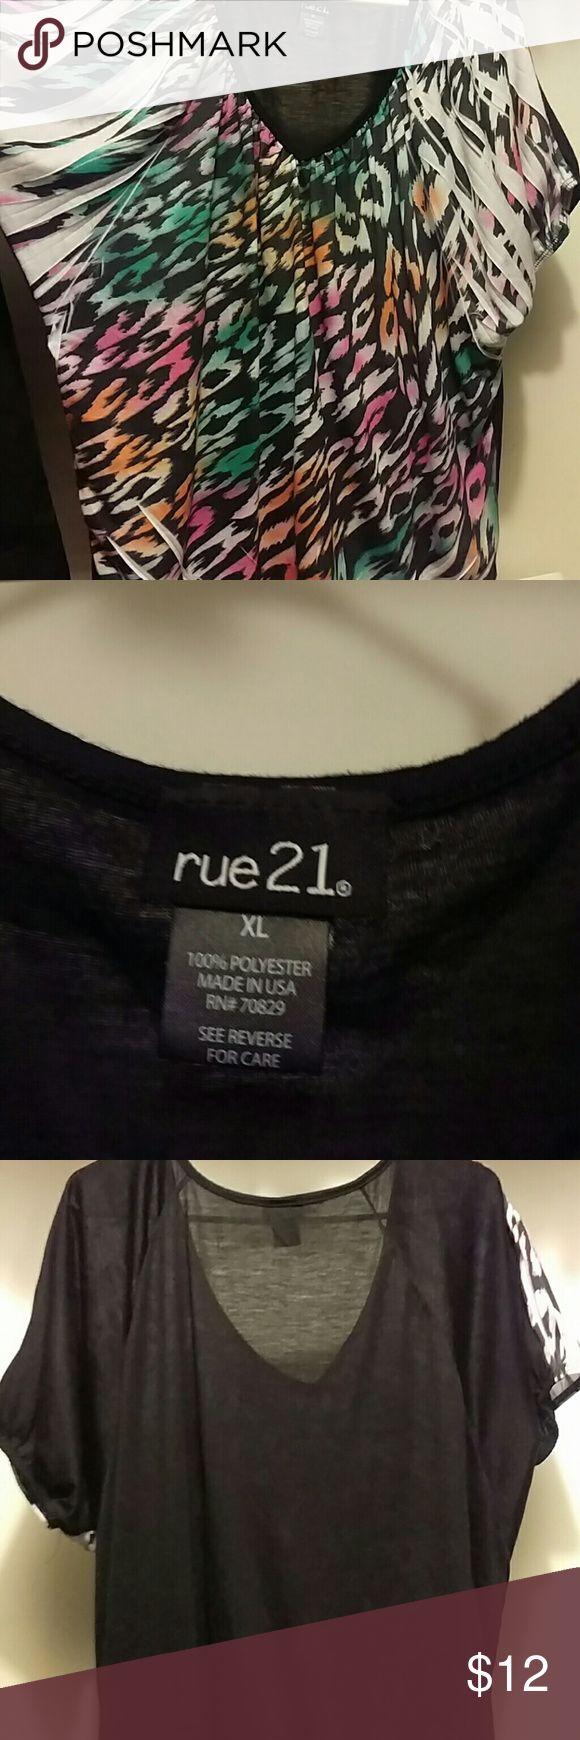 Rue 21 women's Tee Green pink and orange XL women's Rue 21 Tee. Worn once Rue 21 Tops Tees - Short Sleeve